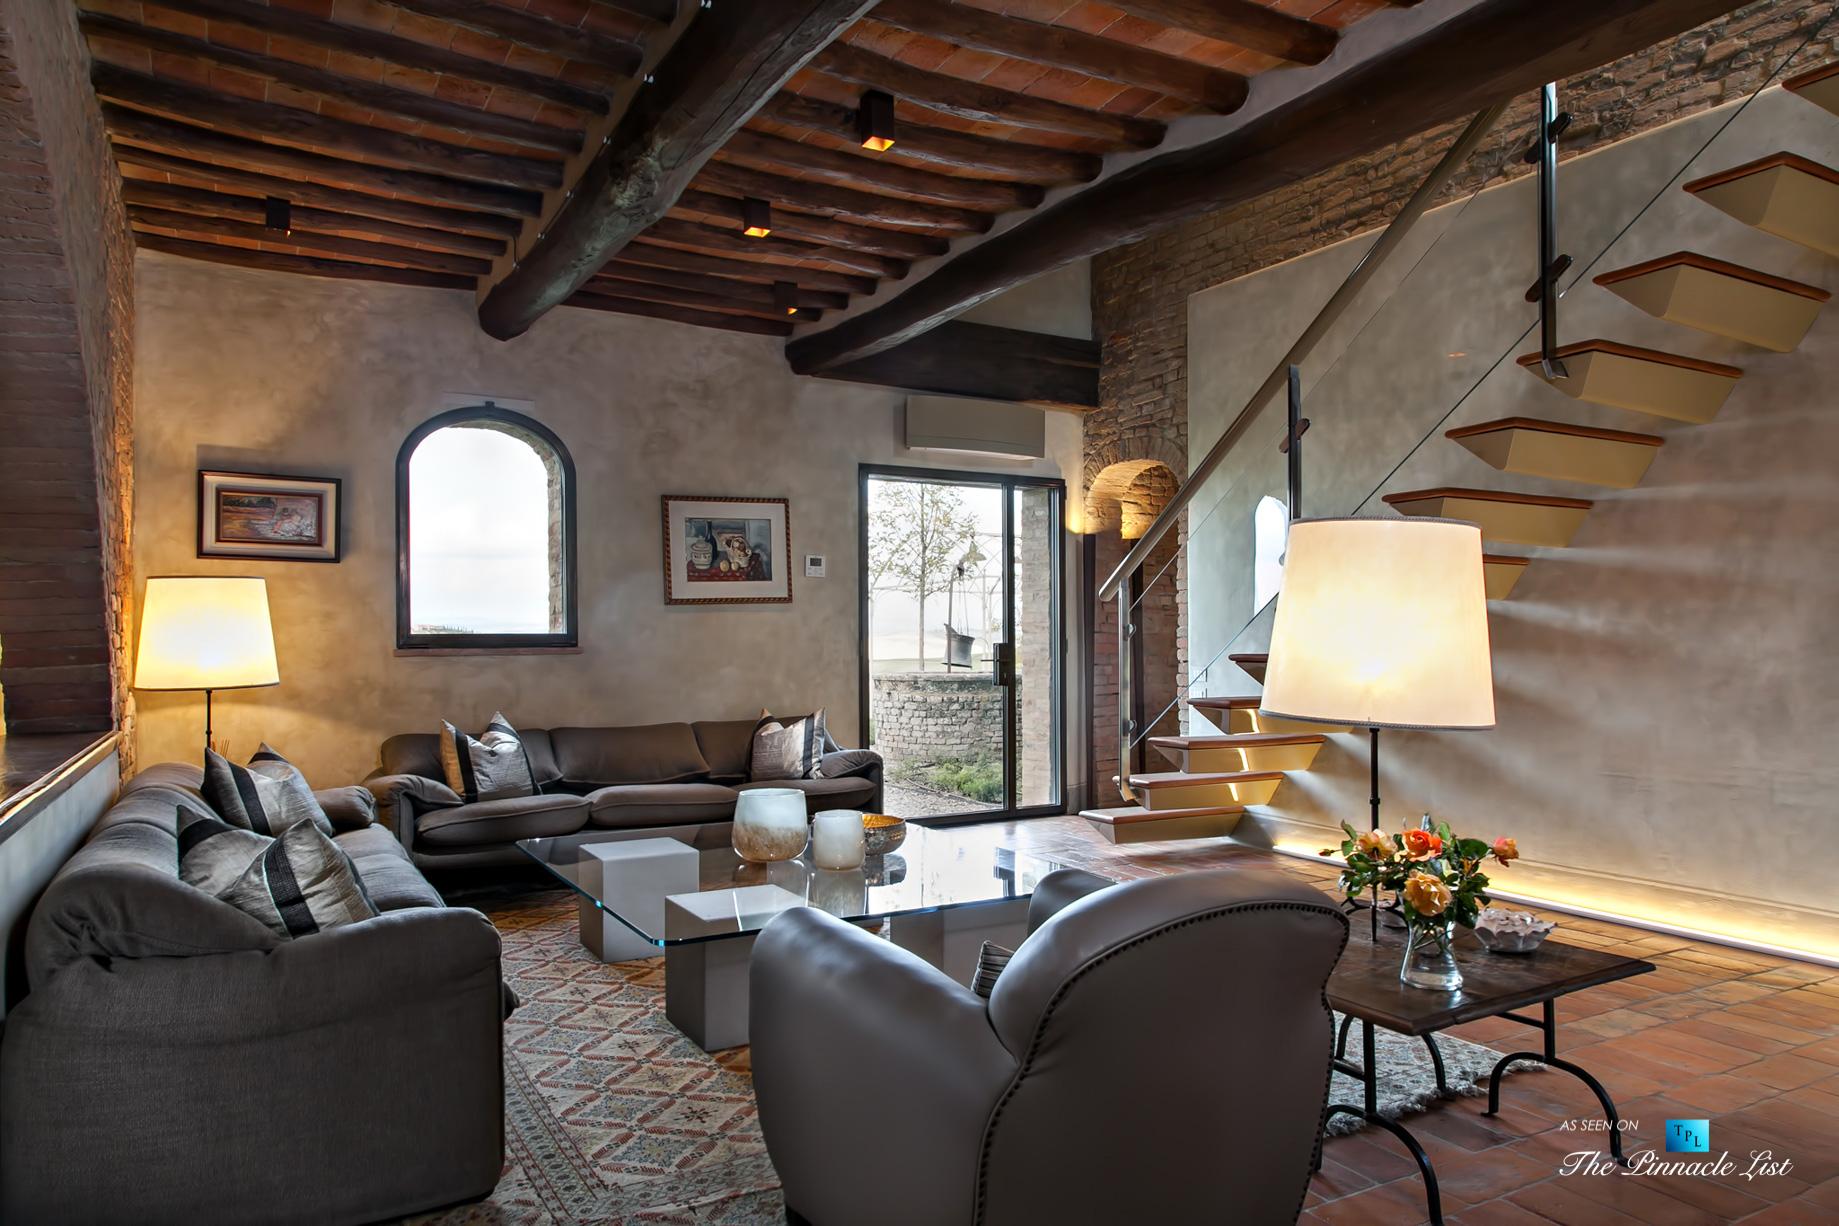 aHistoric Tuscan Villa – Podere Panico Estate, Monteroni d'Arbia, Siena, Tuscany, Italy – Living Room